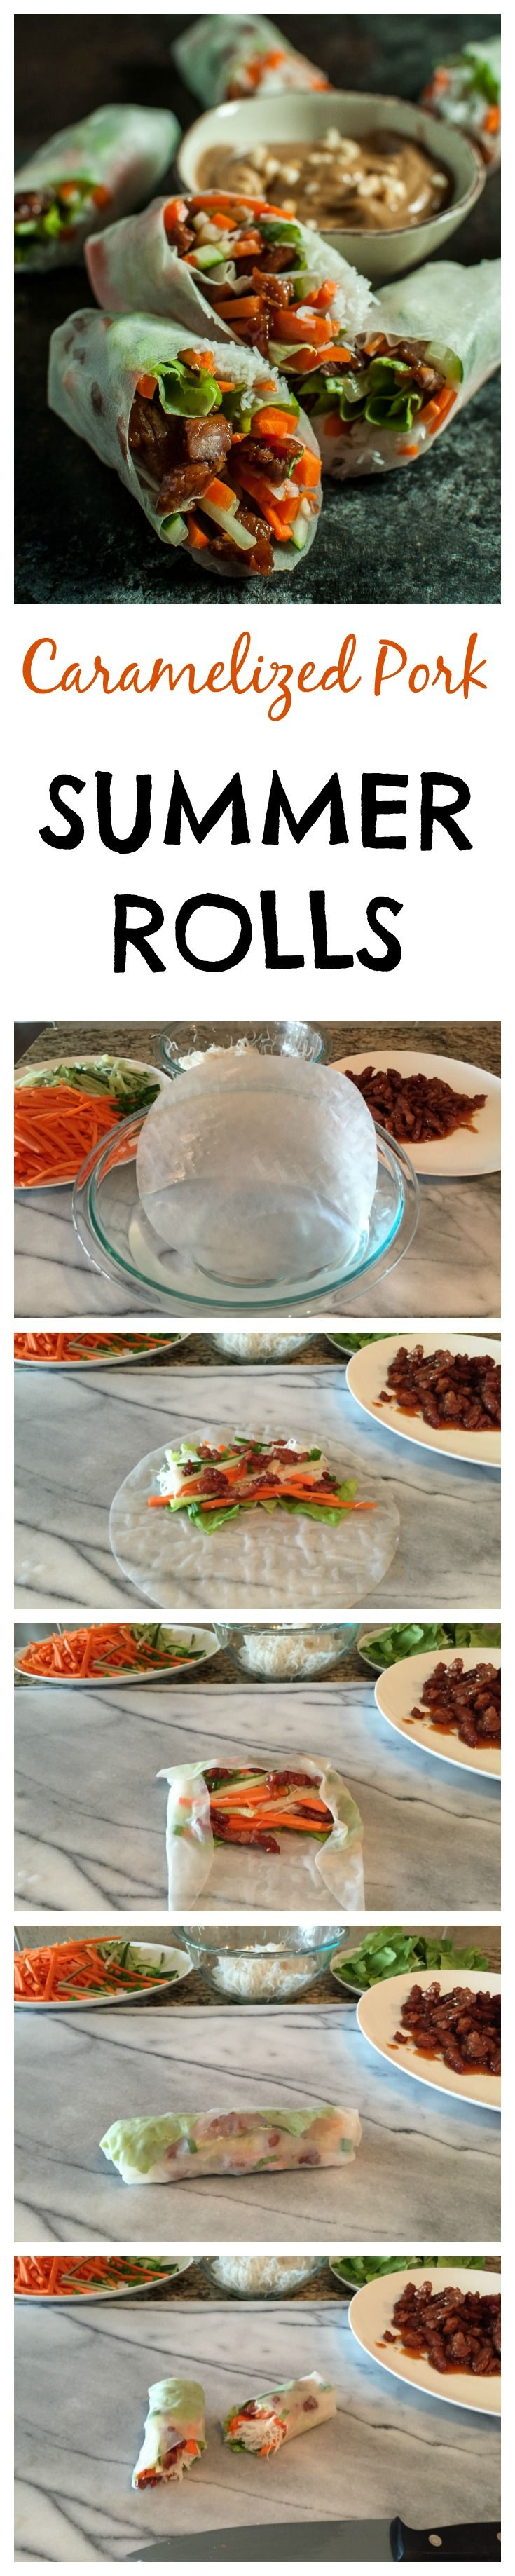 Caramelized Pork Summer Rolls | Recipe | Summer Rolls, Pork and ...